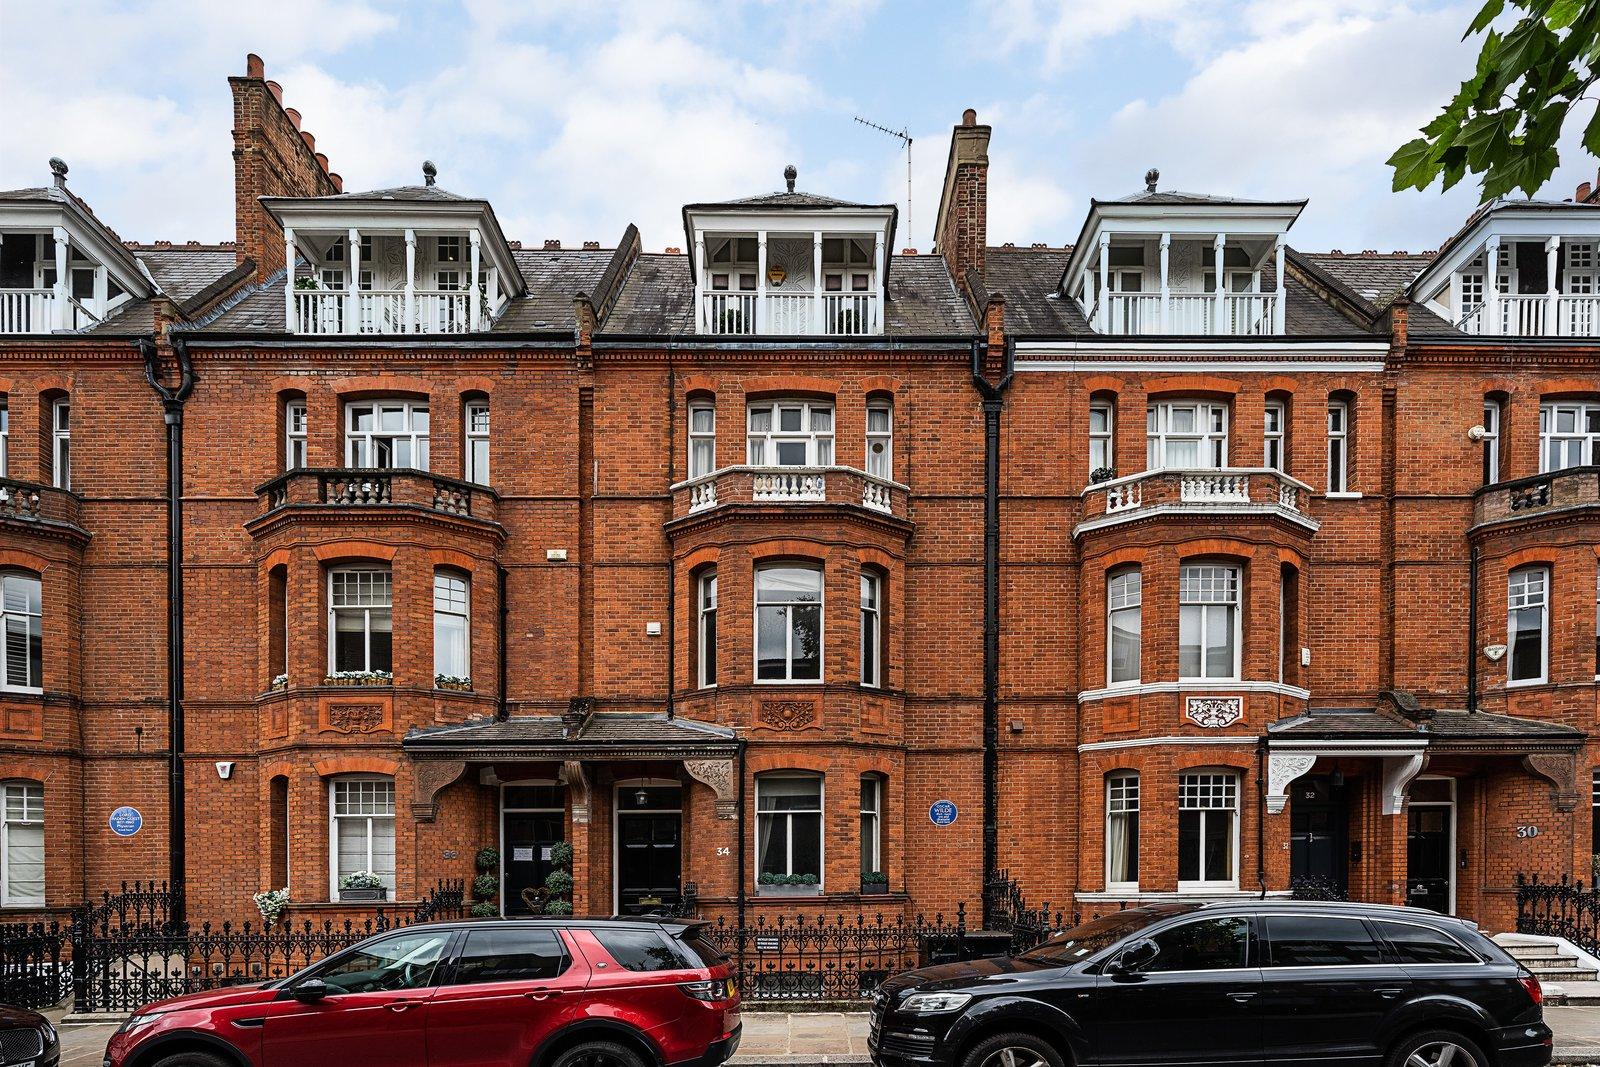 Oscar Wilde Apartment exterior